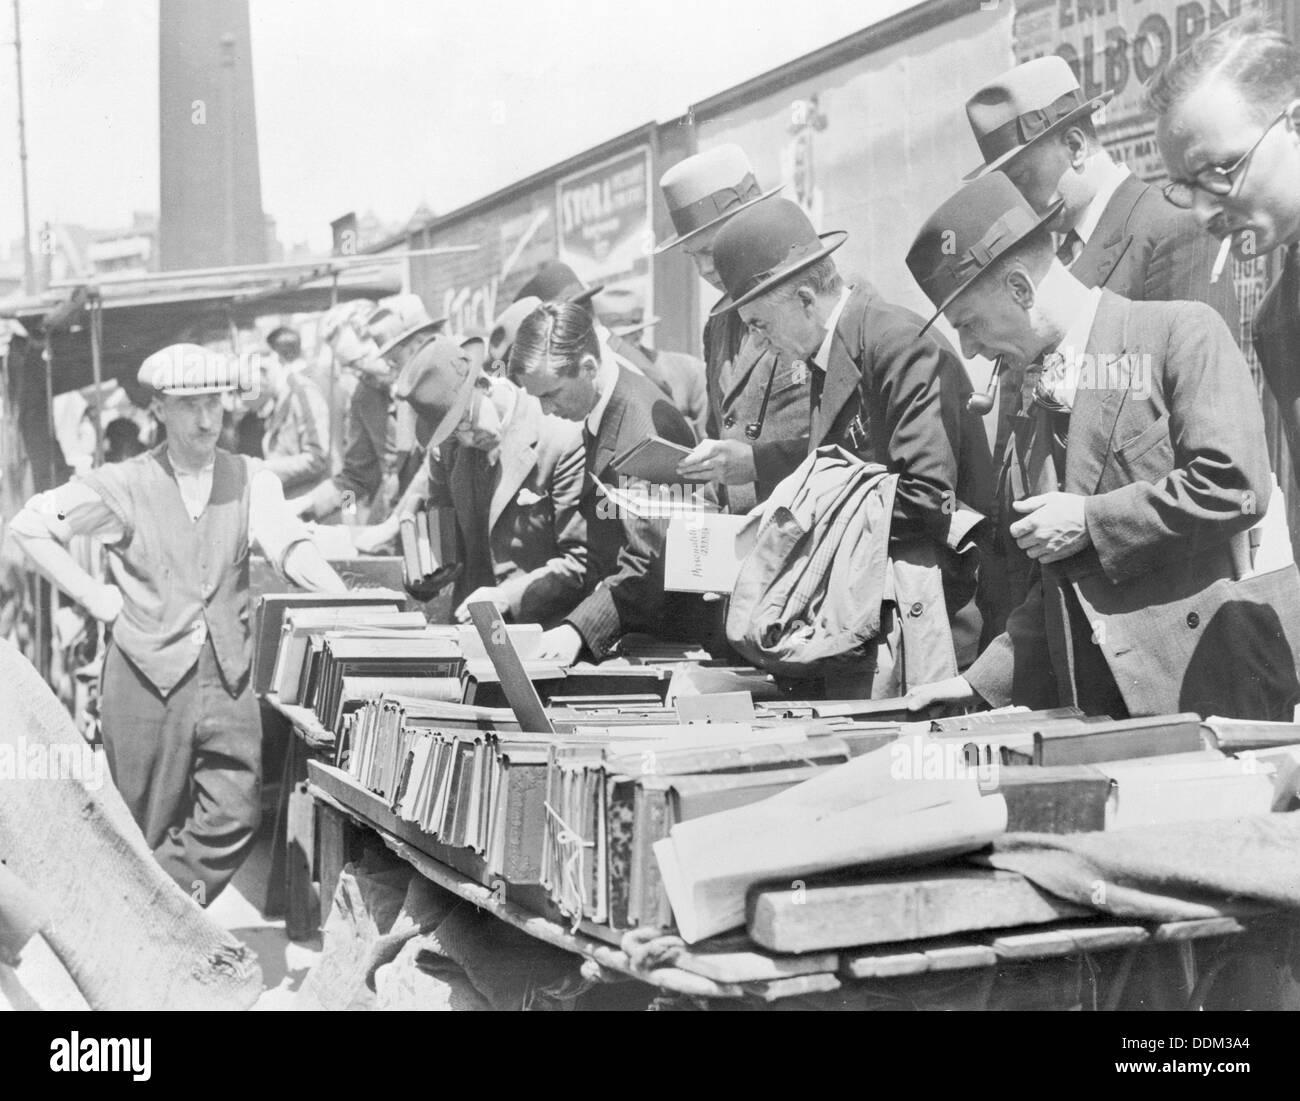 Booksellers in Farringdon Road, London. Artist: John H Stone - Stock Image